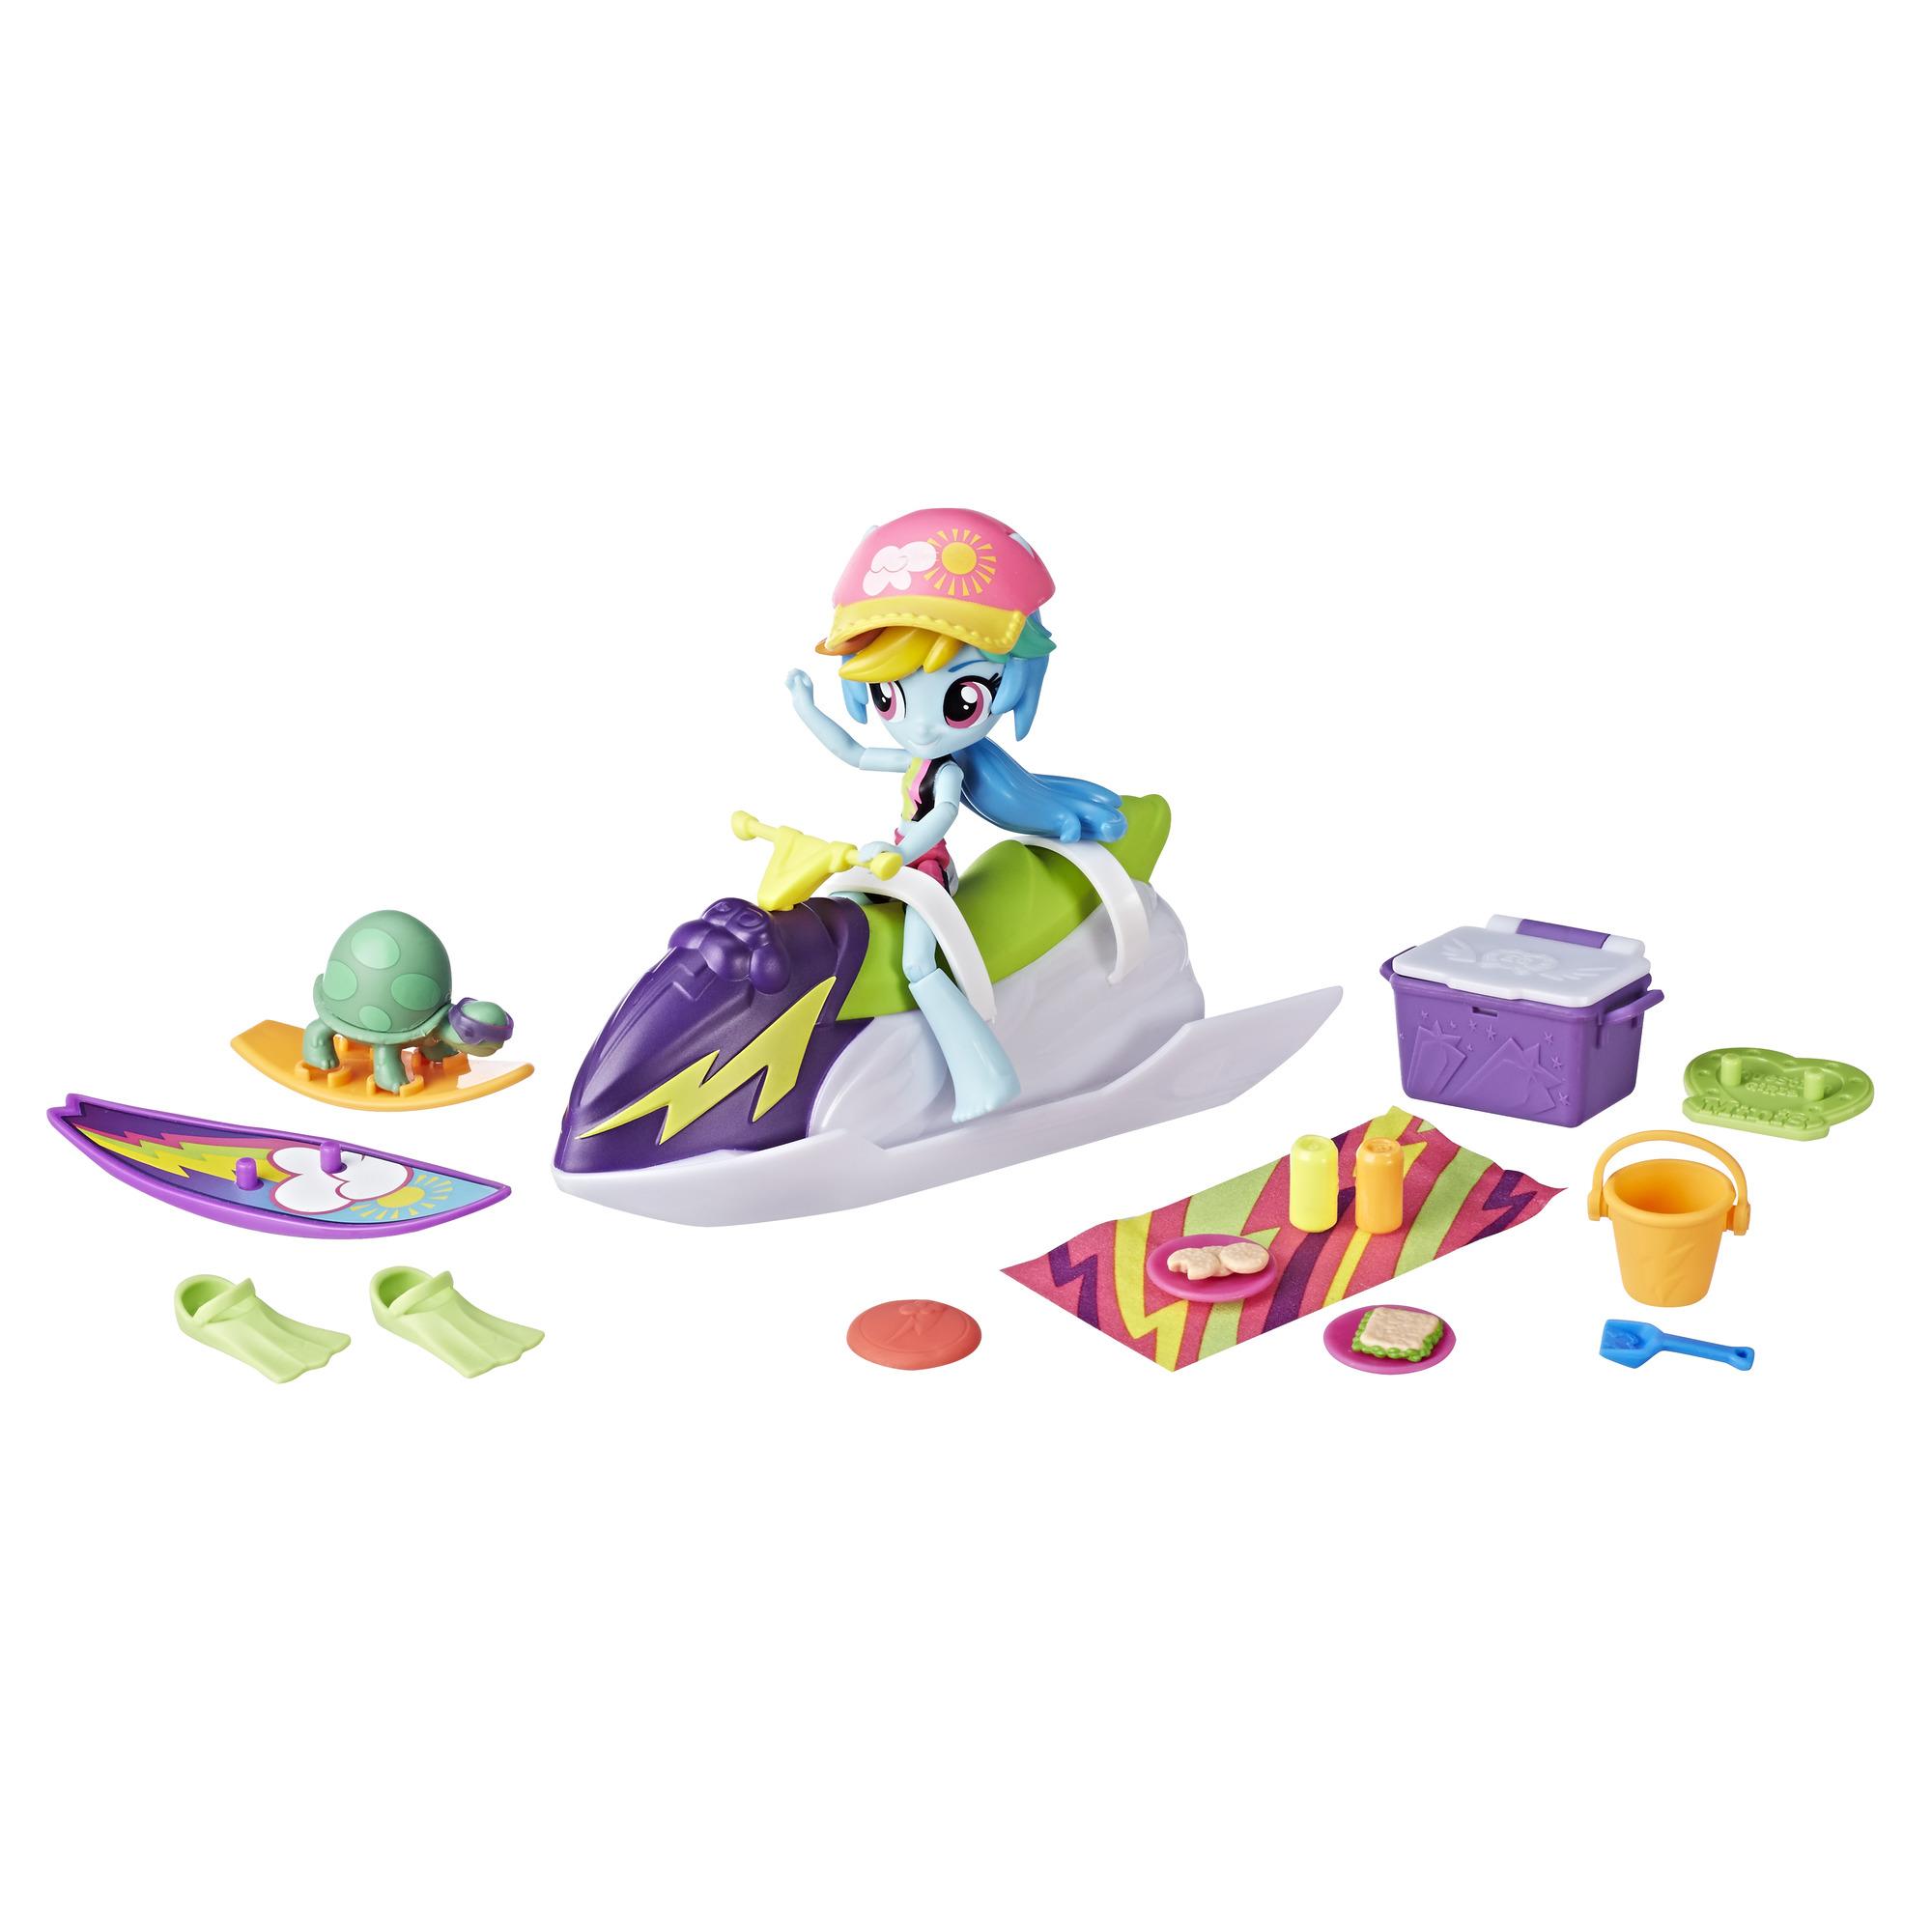 My Little Pony Equestria Girls Rainbow Dash Sporty Beach Set by Hasbro